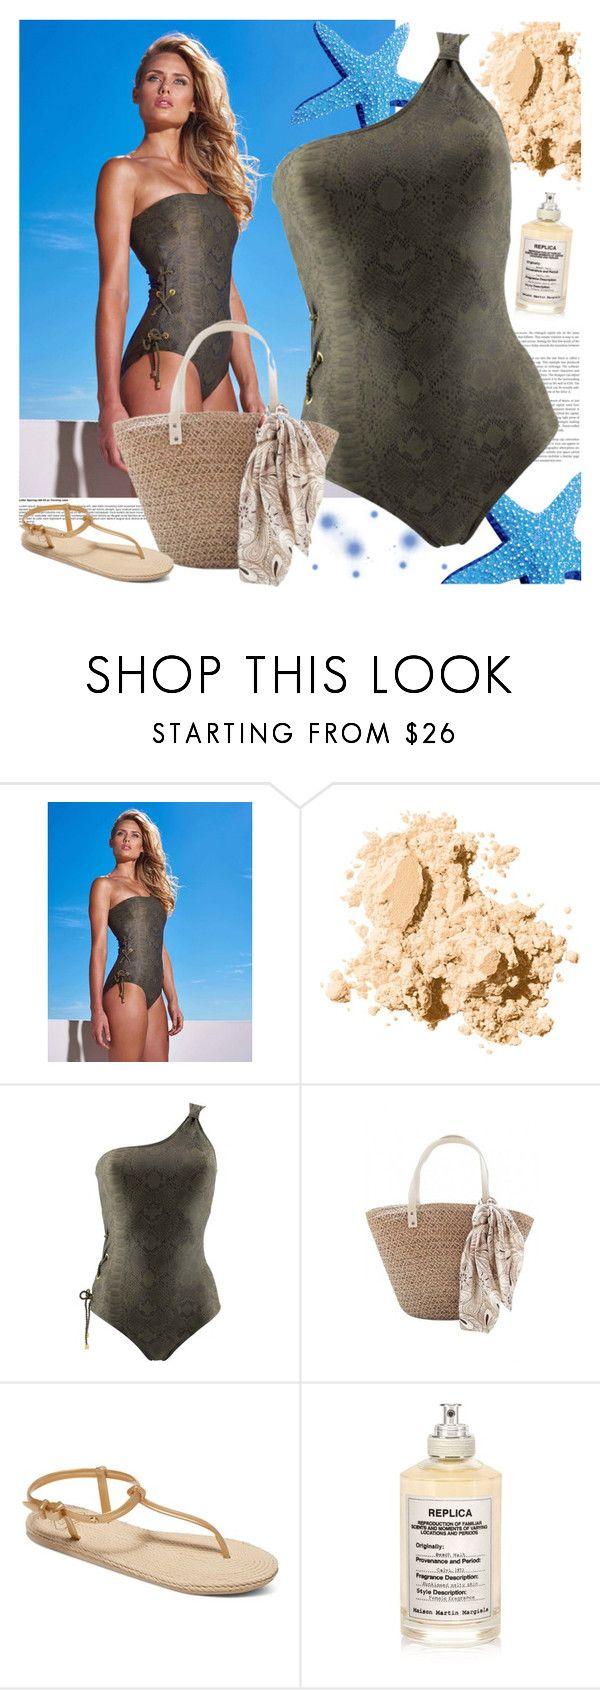 Cobra OnePiece Swimsuit Beachwear, Fashion, Boho women